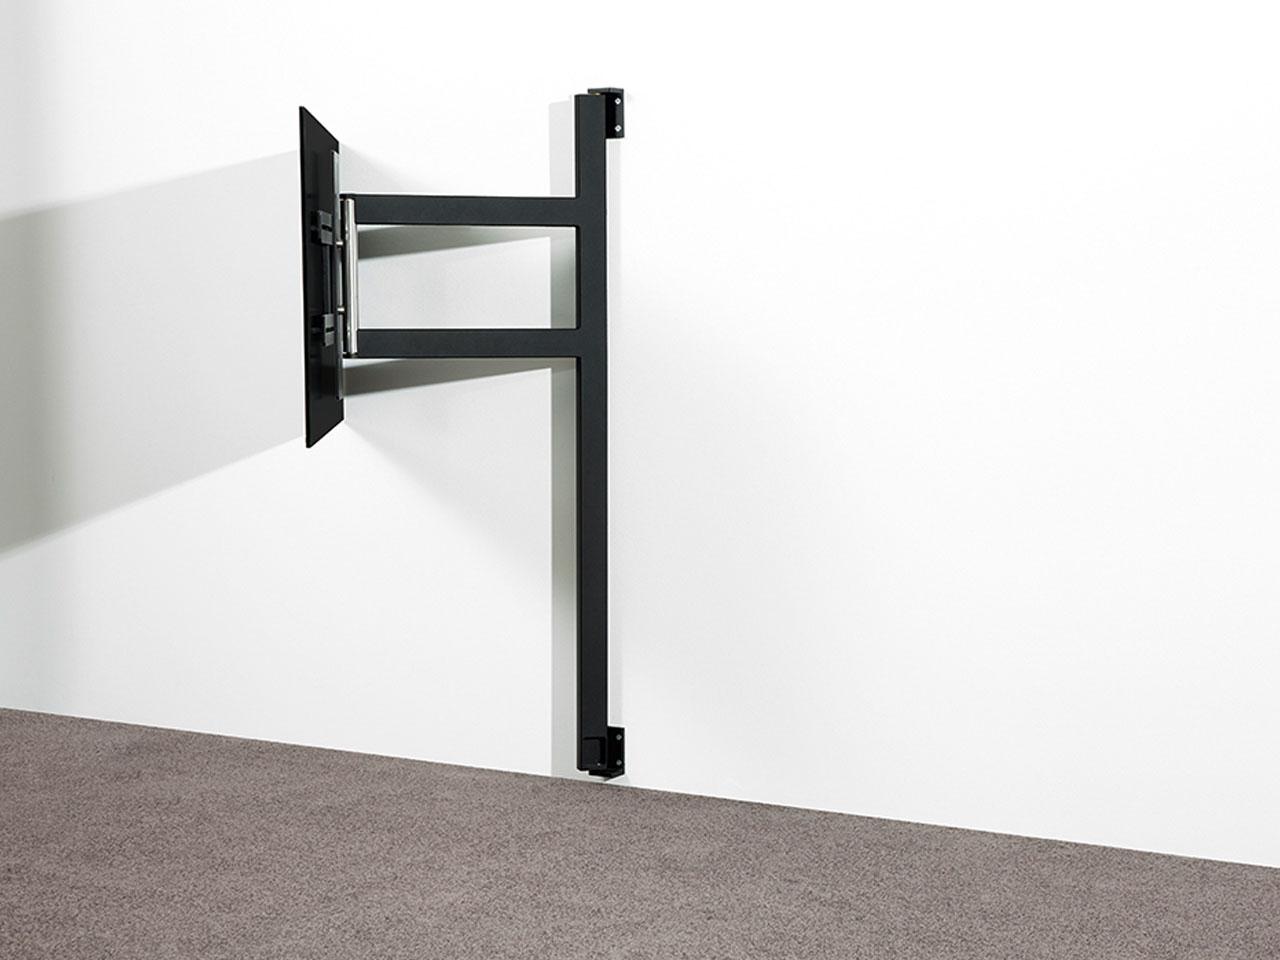 wissmann tv halter solution art121 g nstig kaufen cmb systeme. Black Bedroom Furniture Sets. Home Design Ideas